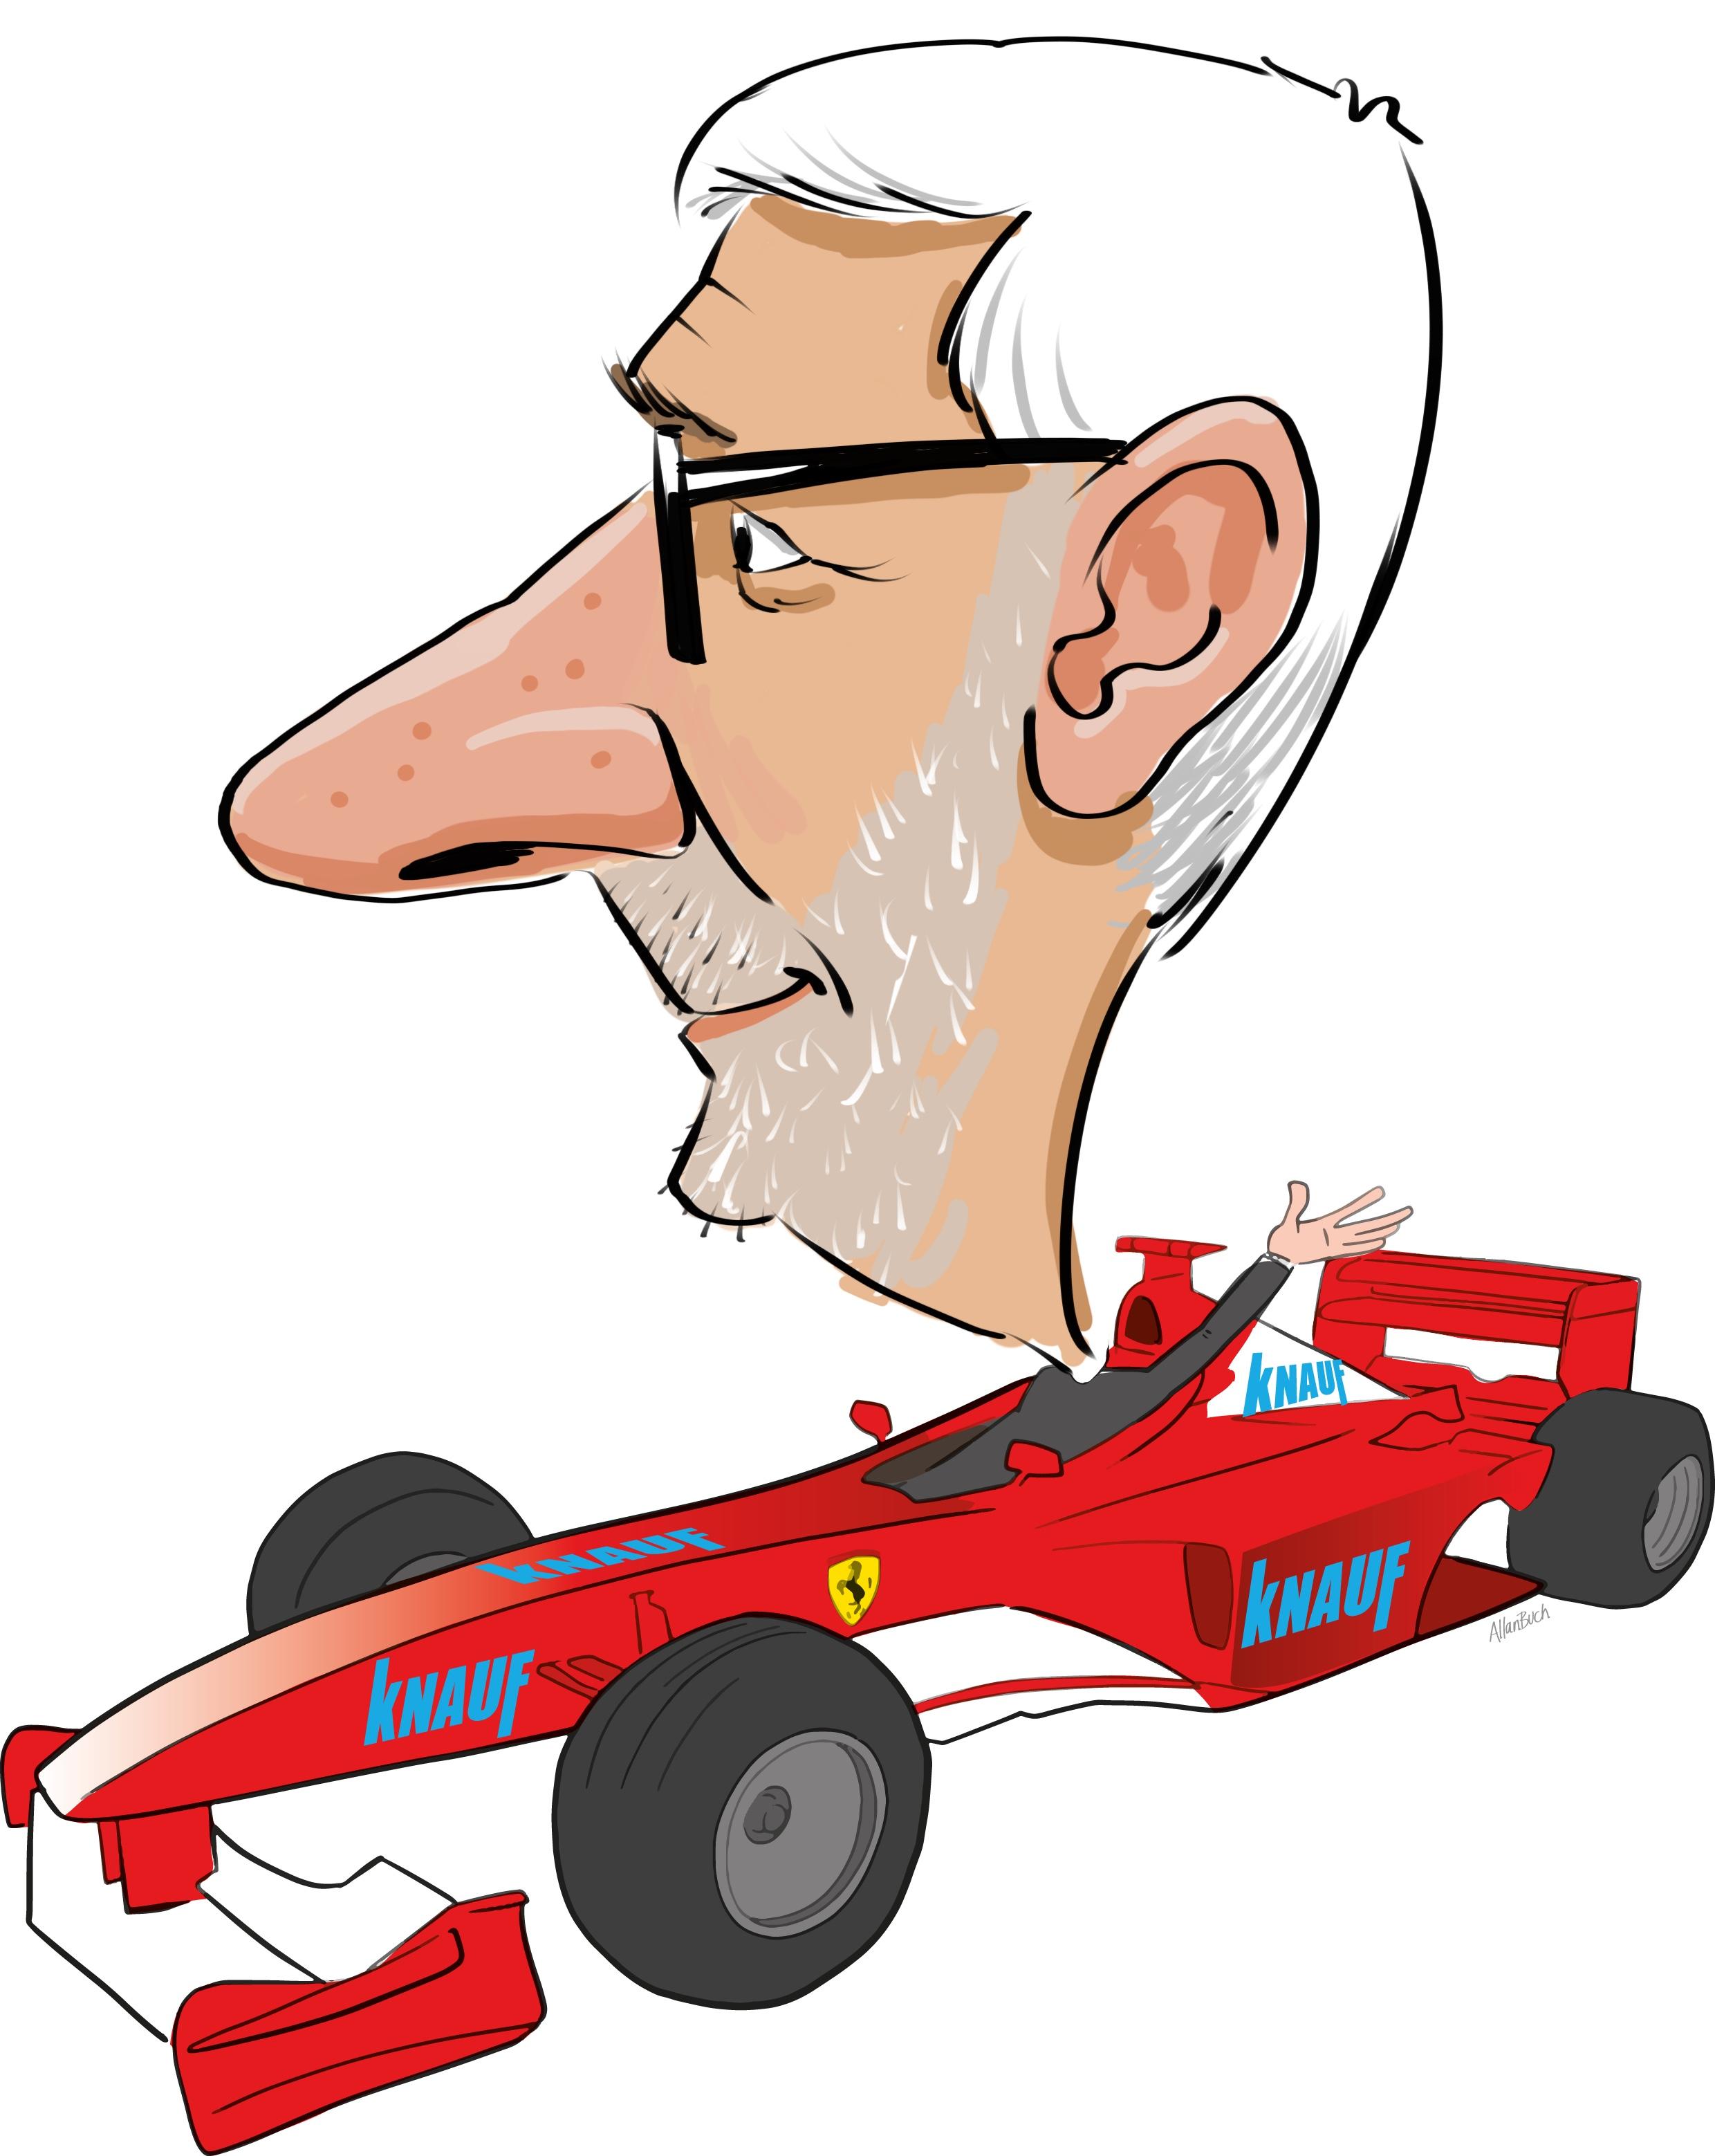 ipad Live karikatur med Allan Buch. farve profiltegning4